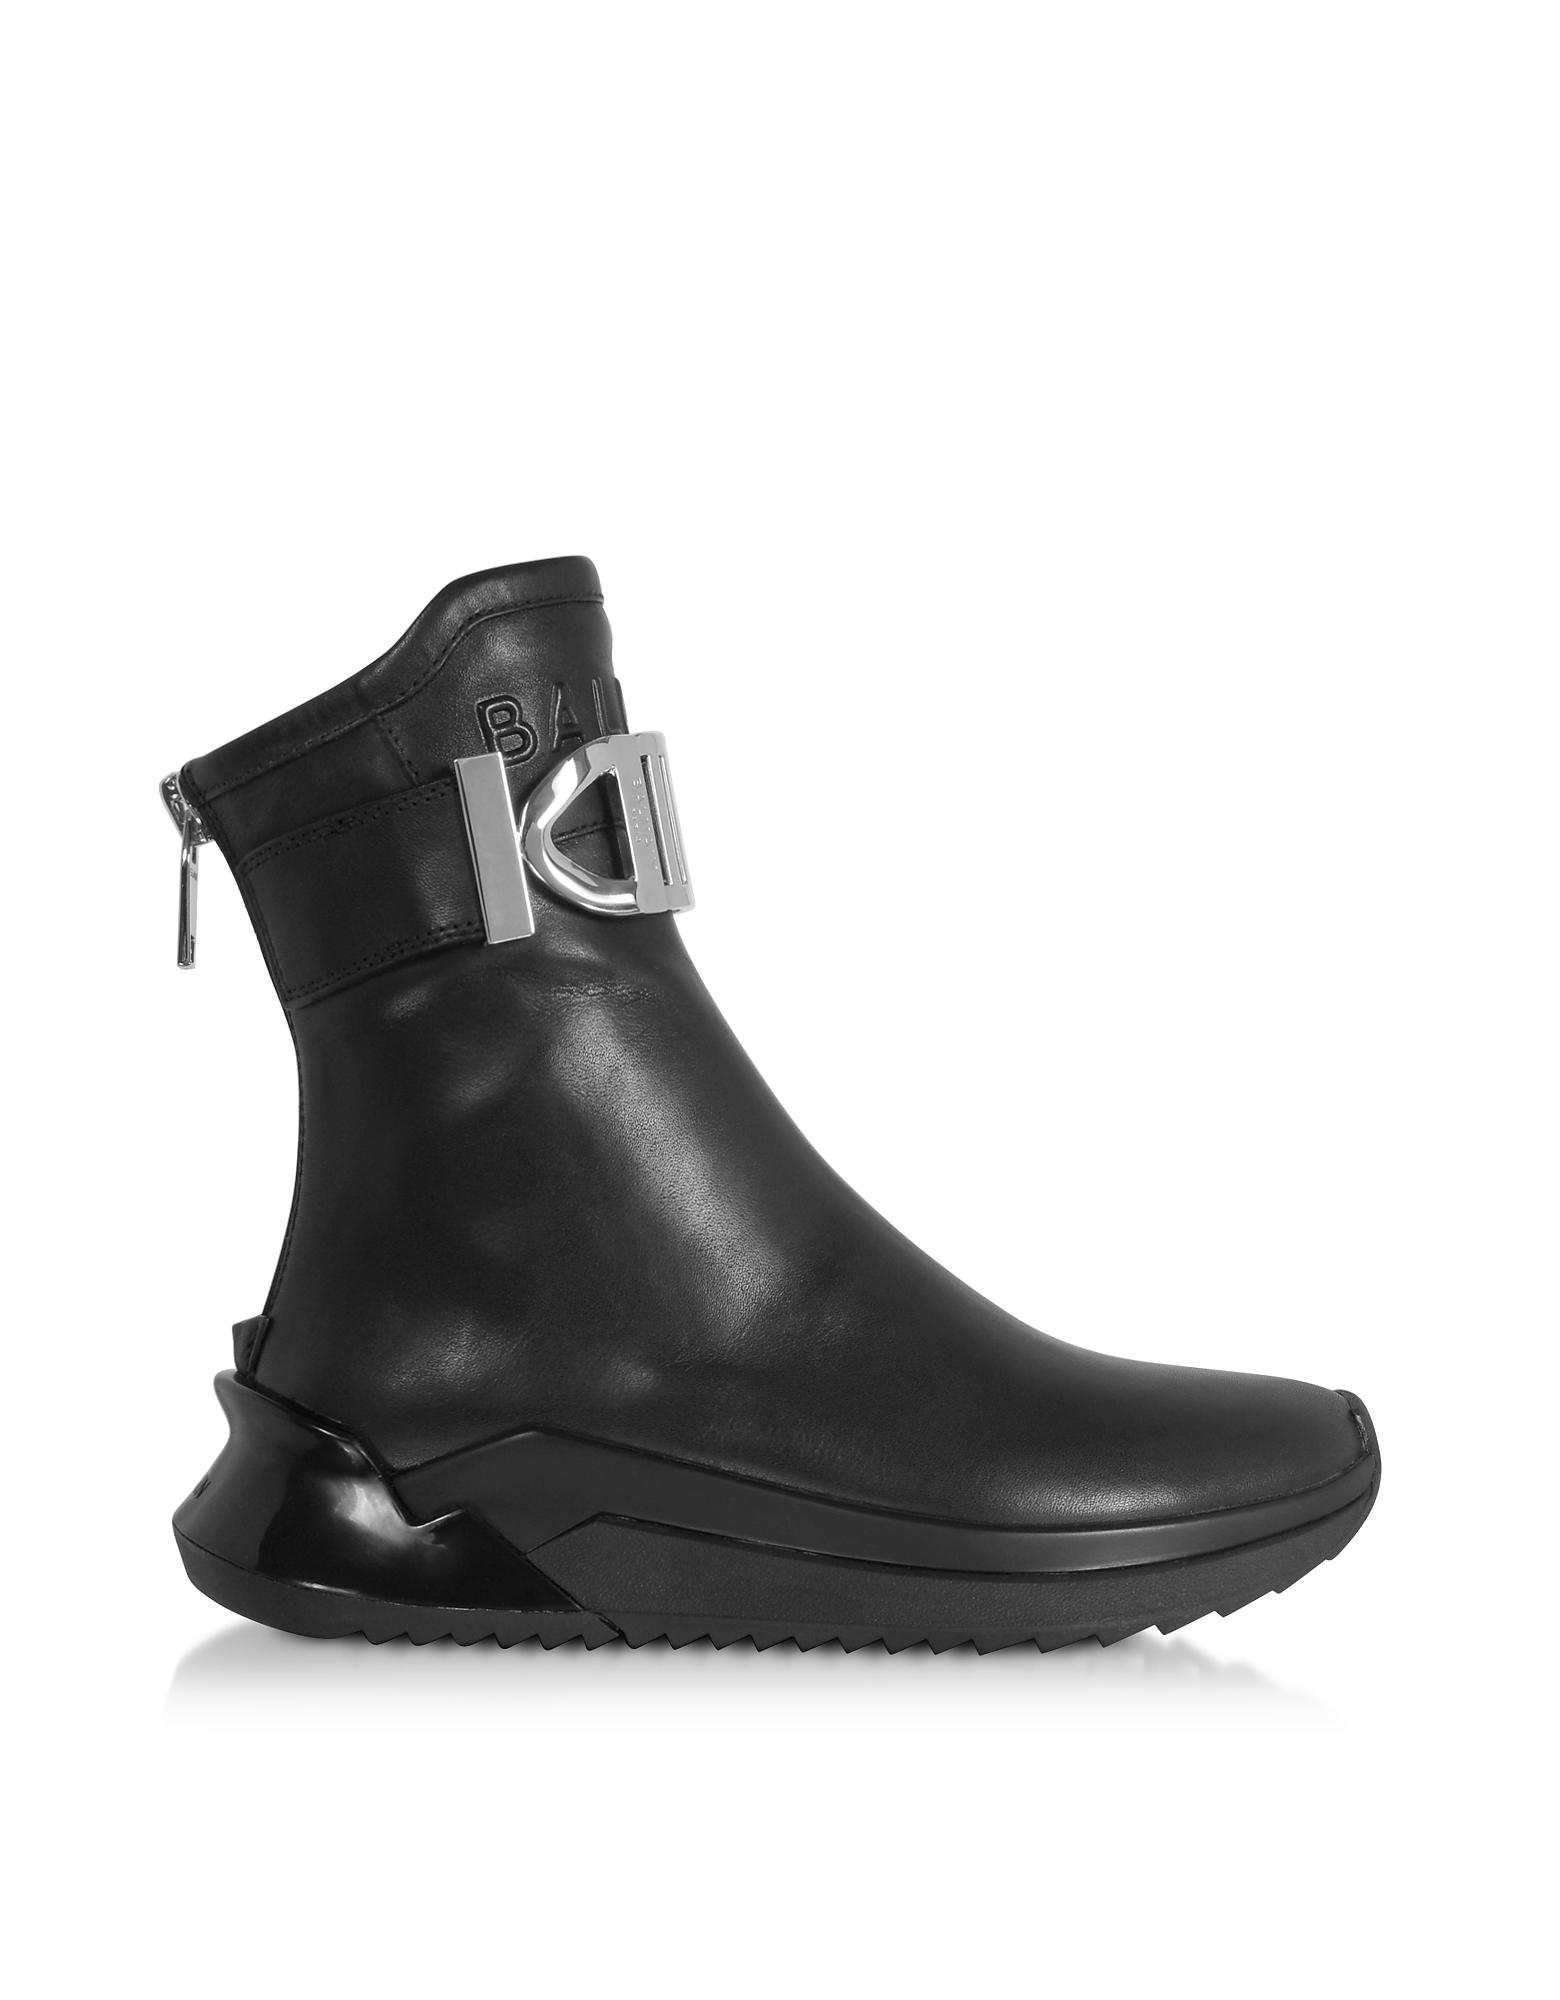 Balmain Designer Shoes, Black B-Glove Nappa Sneakers